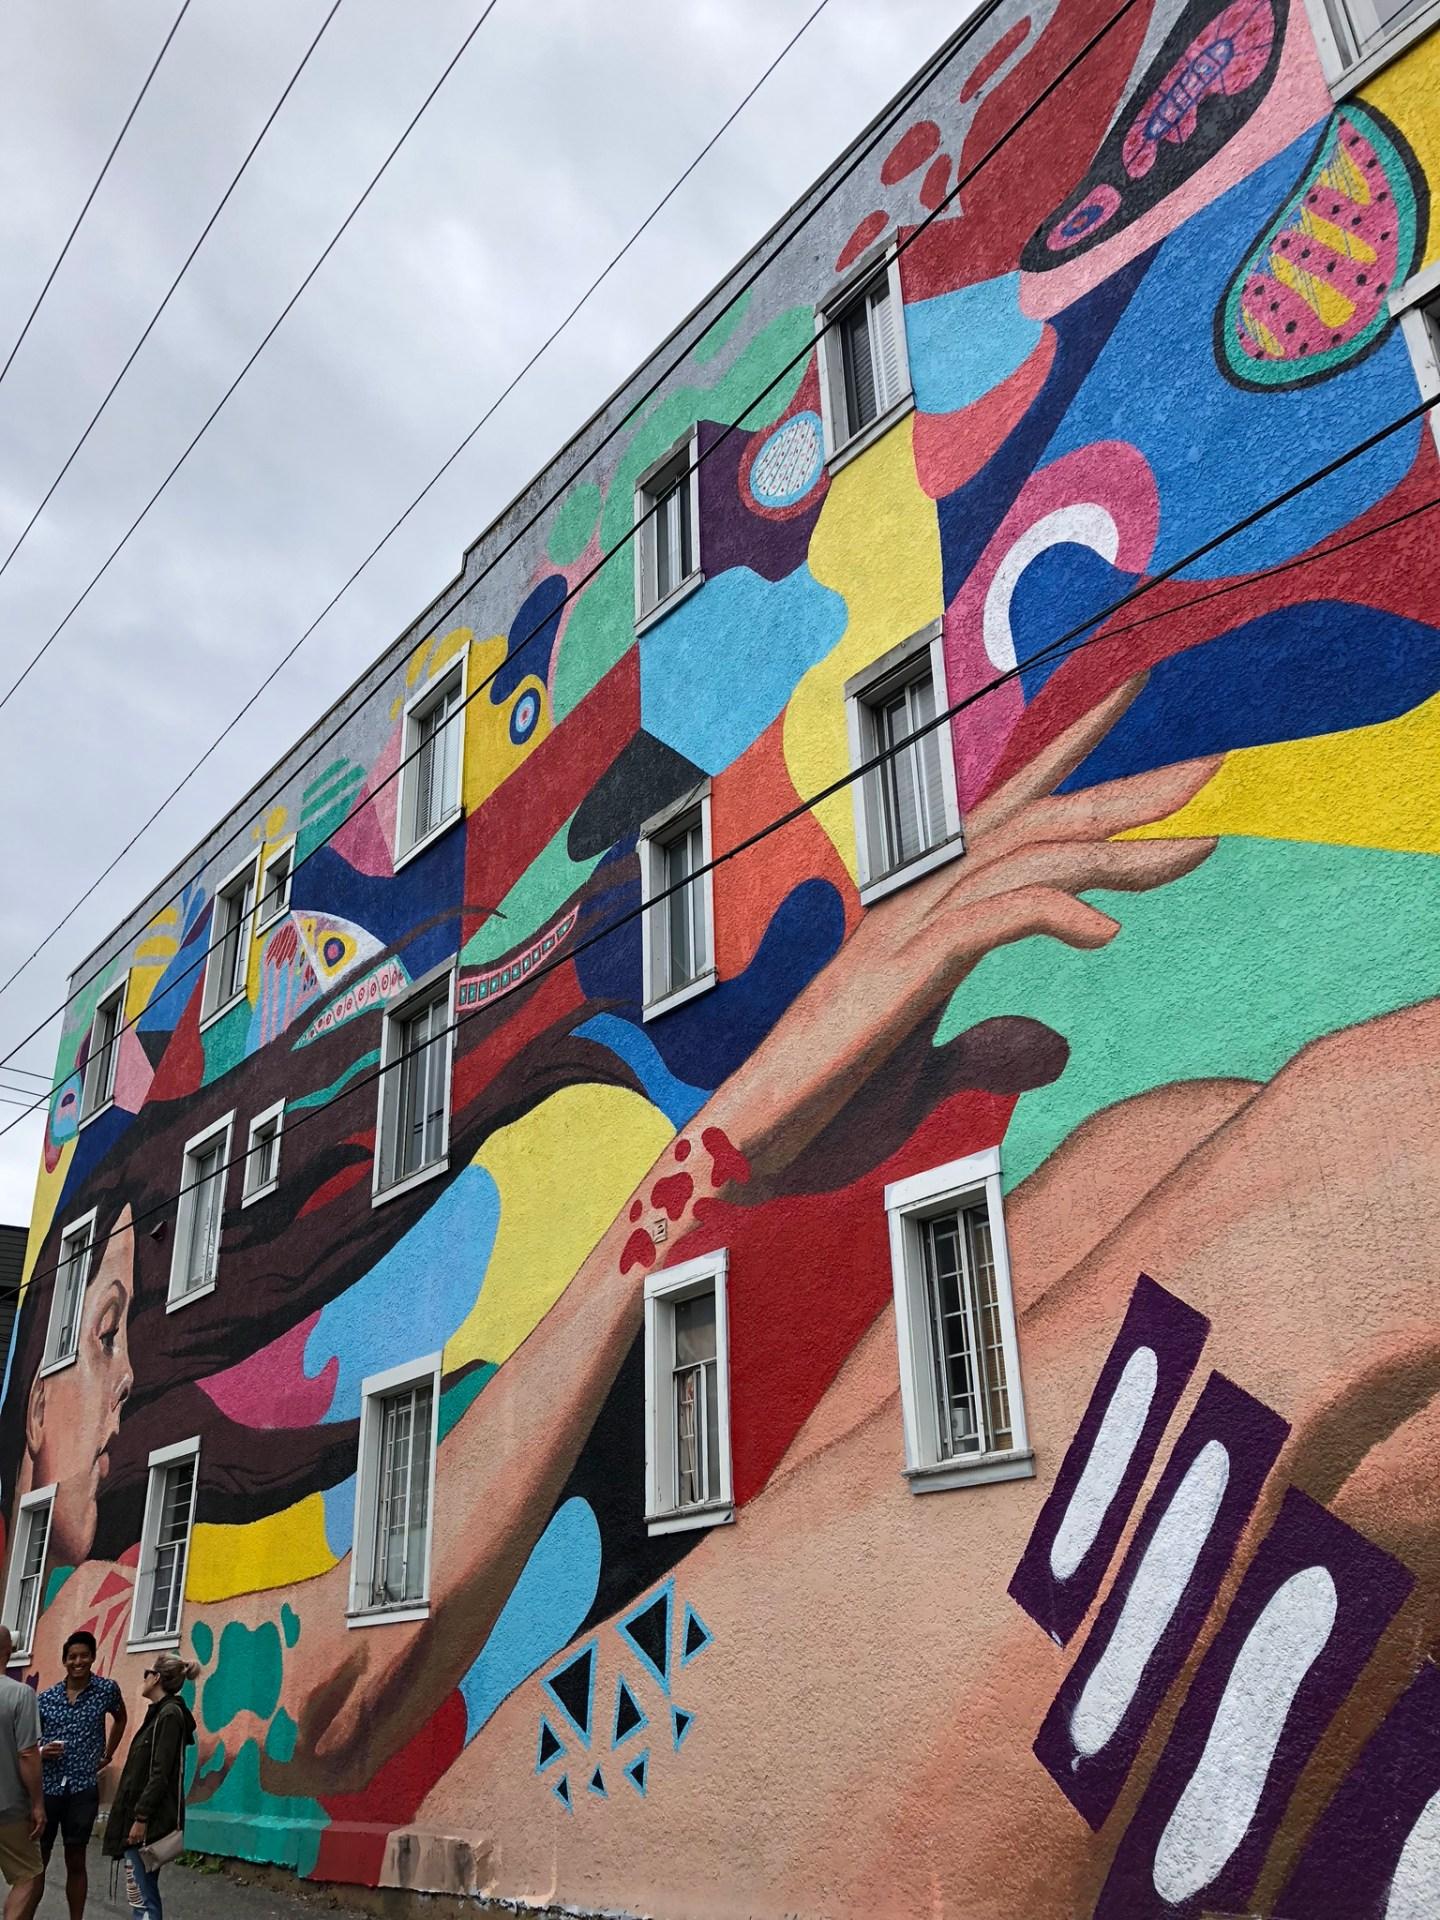 Giant mural at Vancouver Mural Festival